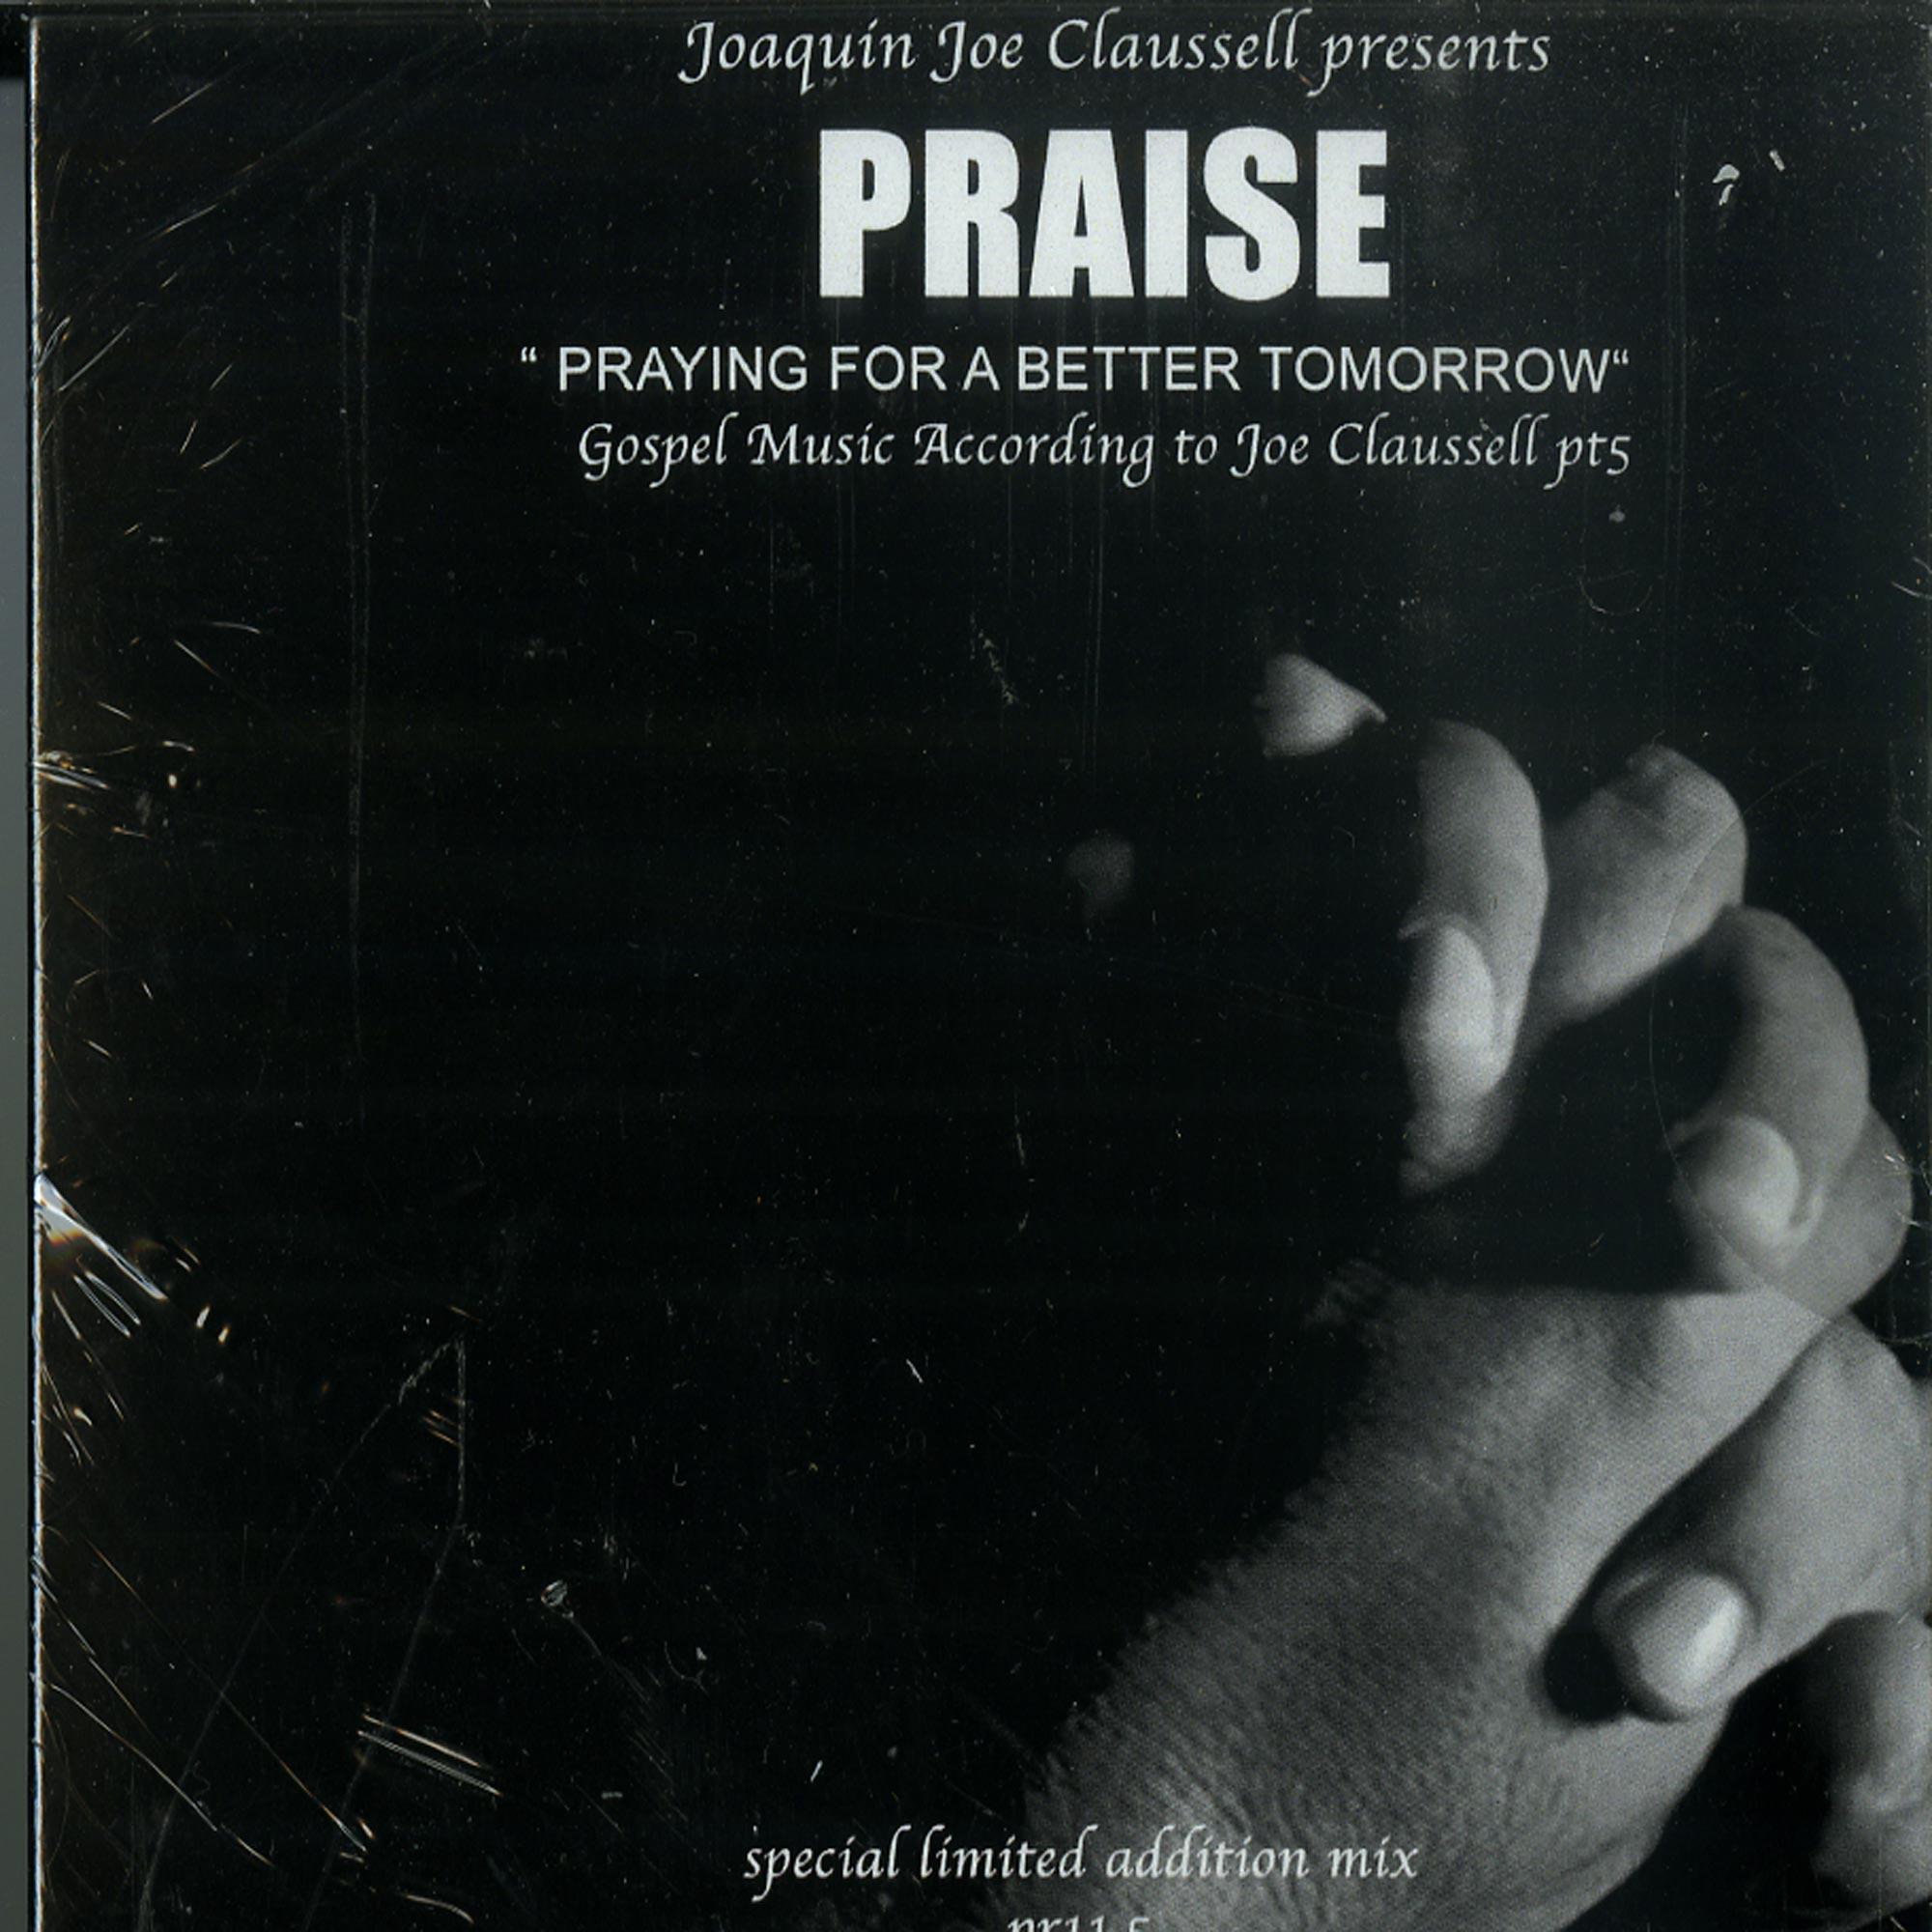 Joaquin Joe Claussell - PRAISE PART 5 -  Praying for a better tomorrow